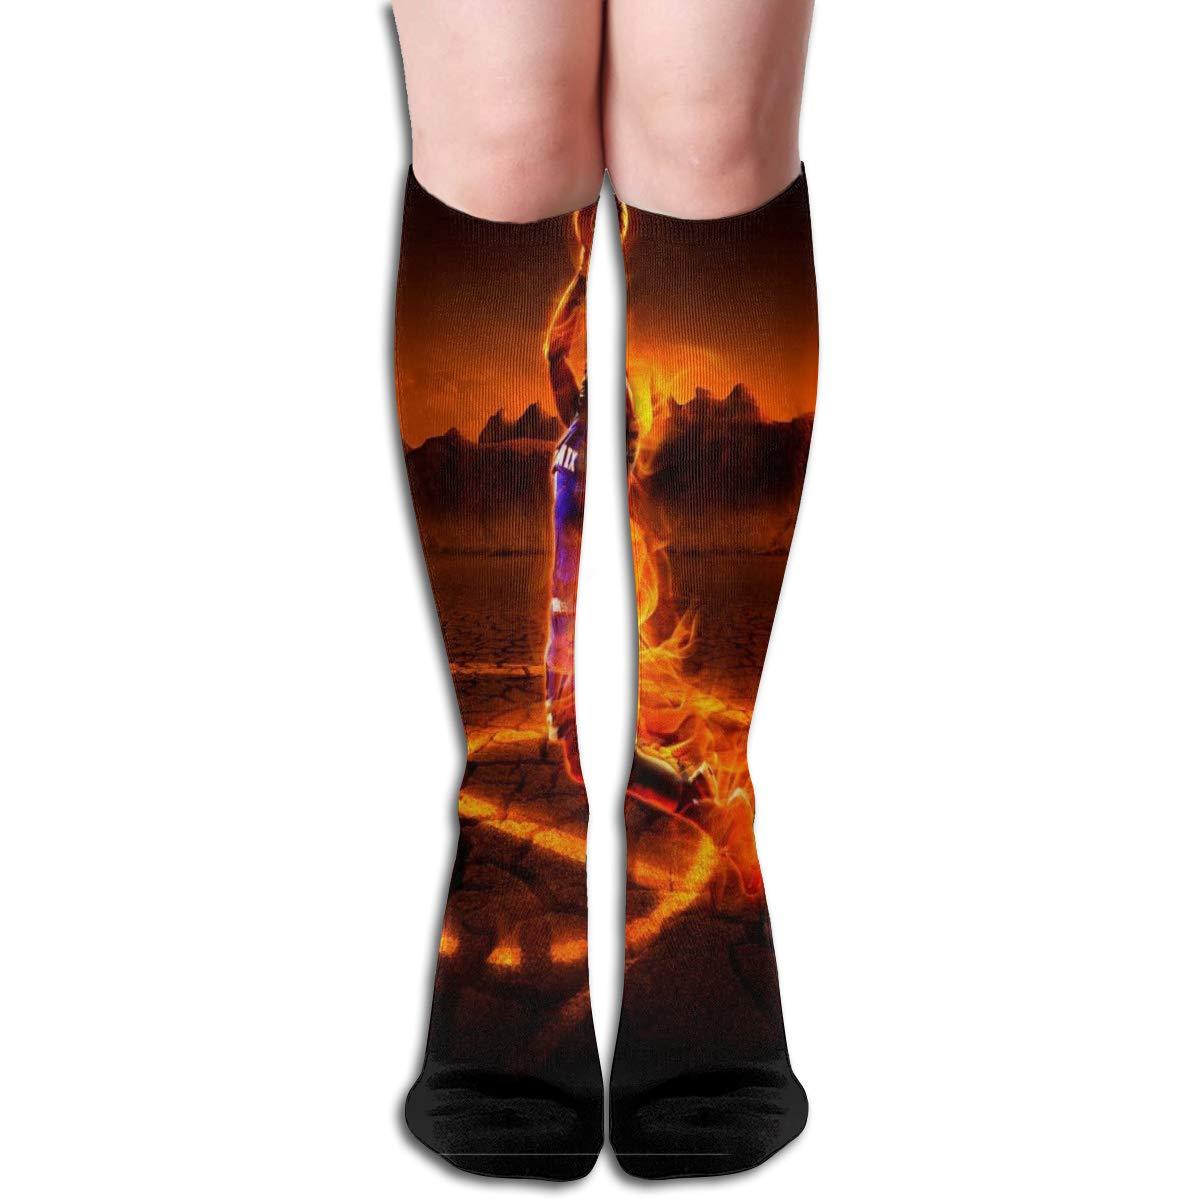 Girls Socks Mid-Calf Fire Basketball Winter Special For Halloween